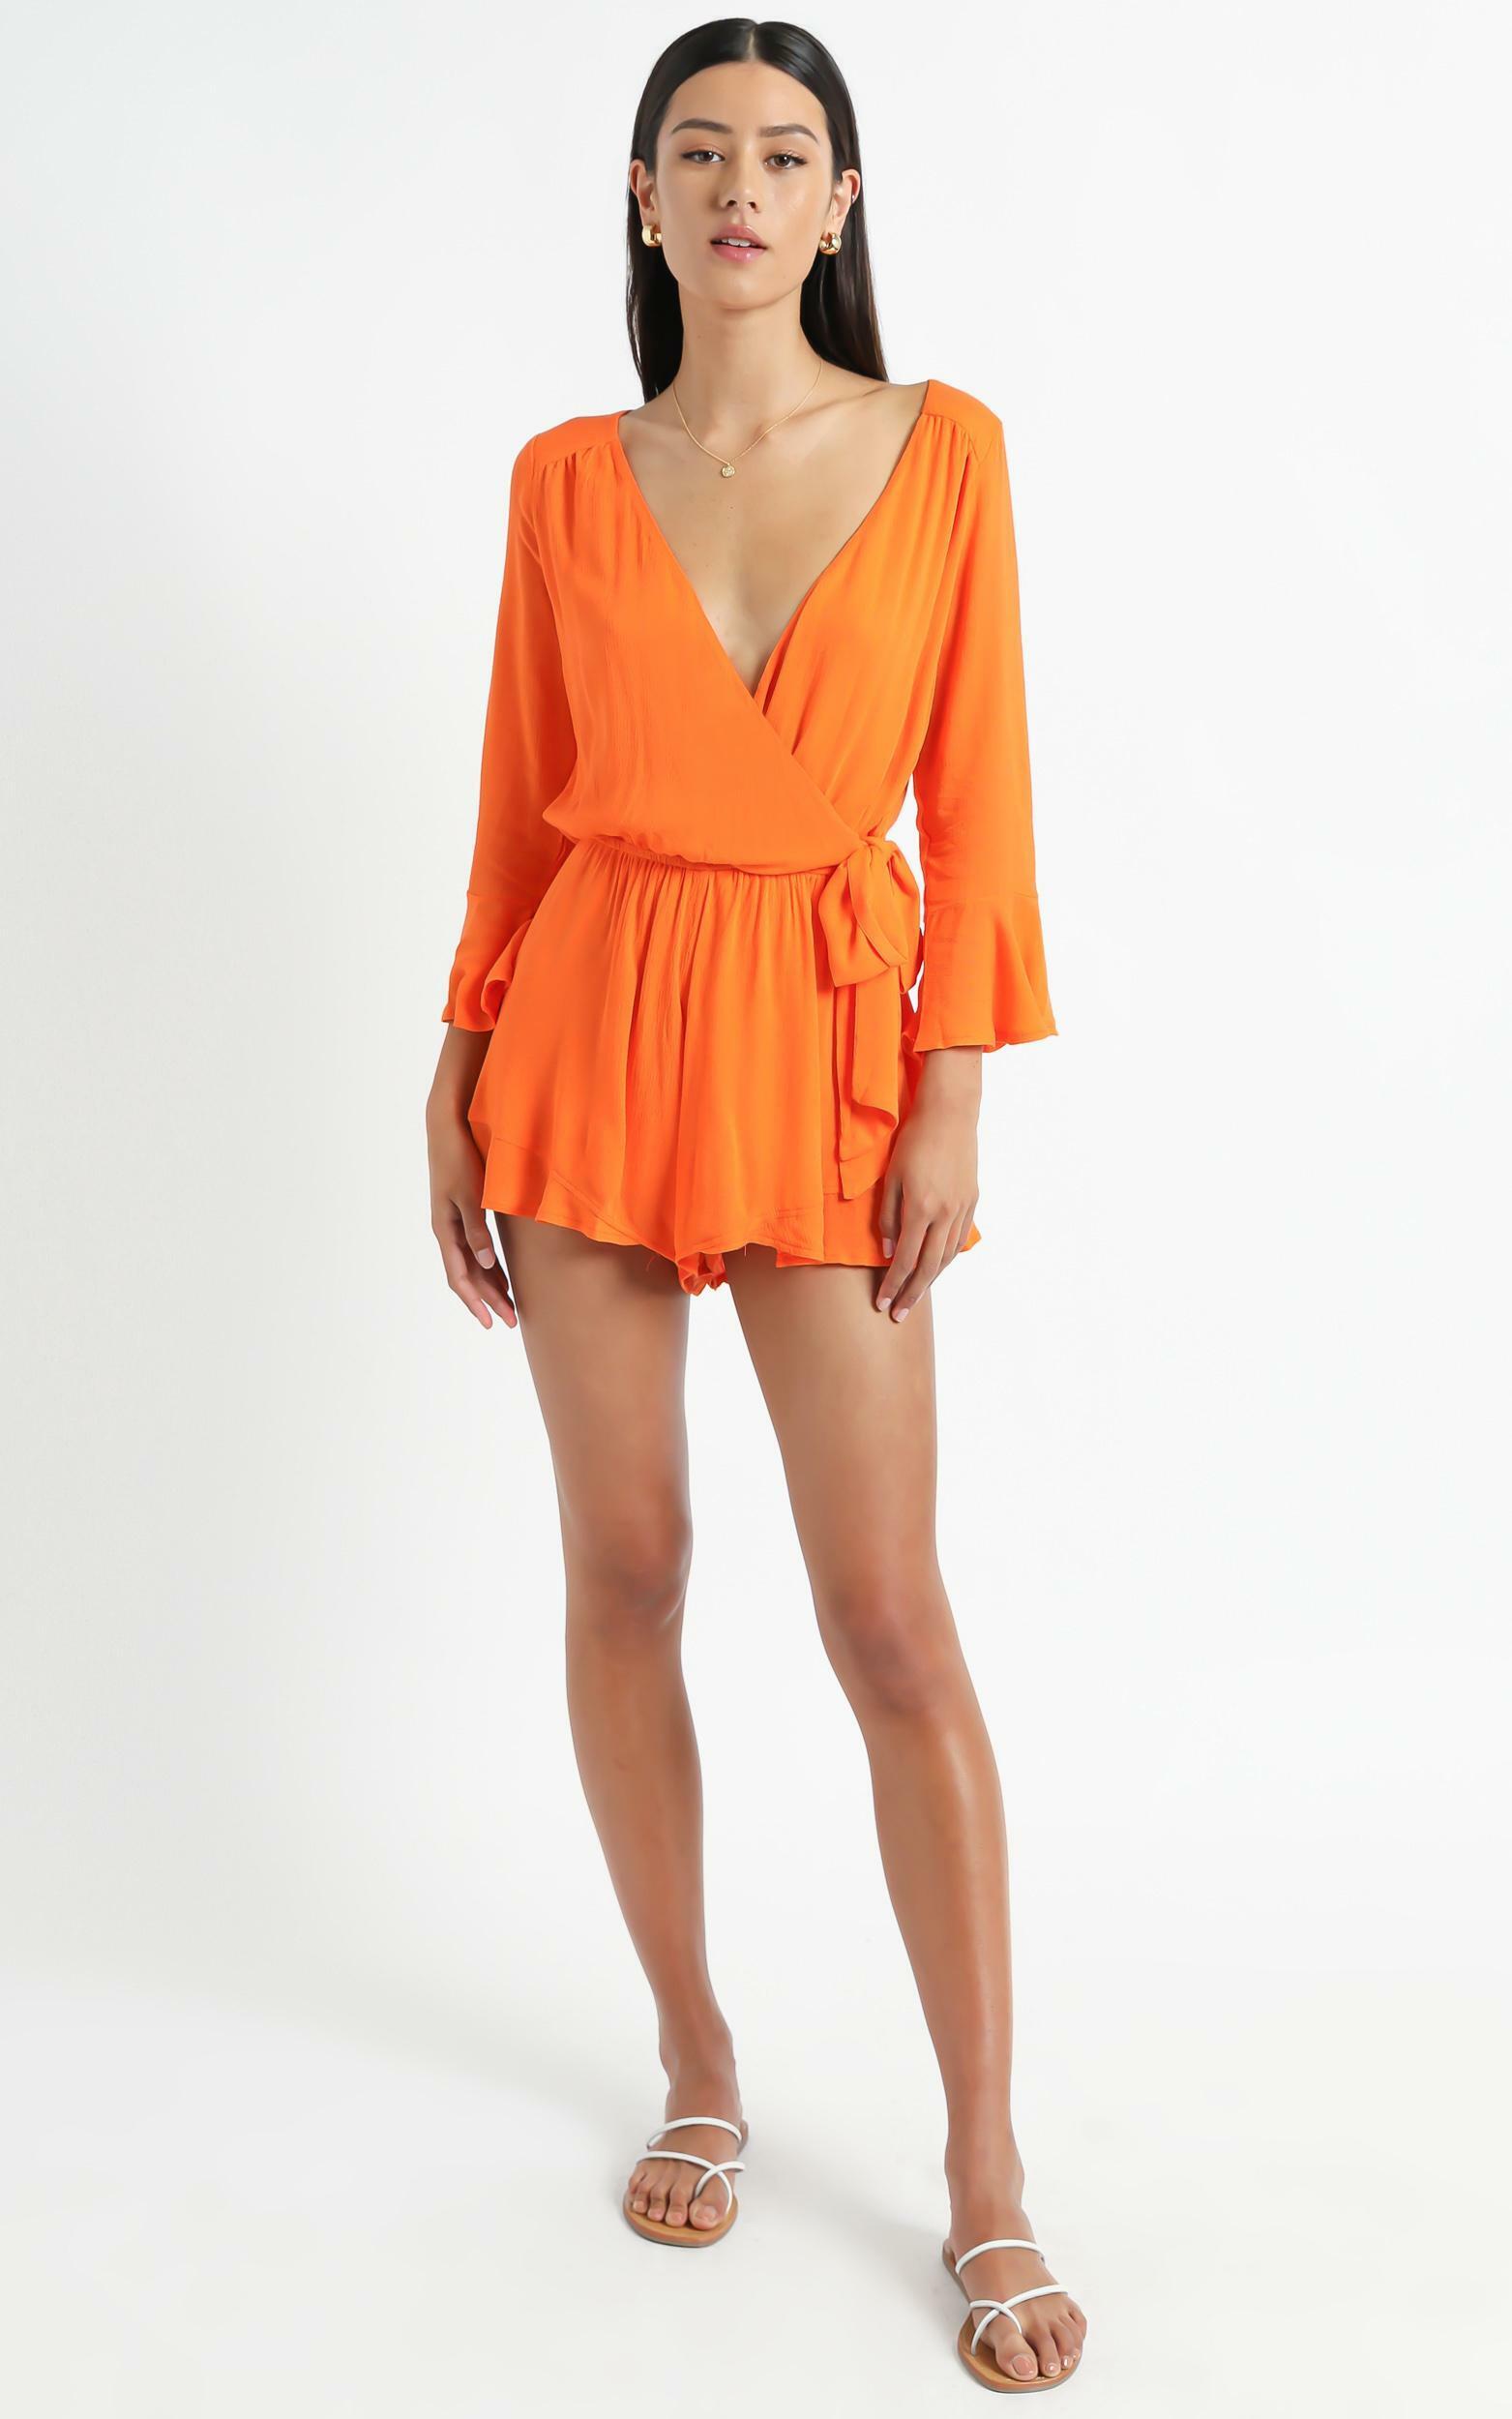 Sunday Breeze Playsuit In Tangerine Linen Look - 4 (XXS), Orange, hi-res image number null